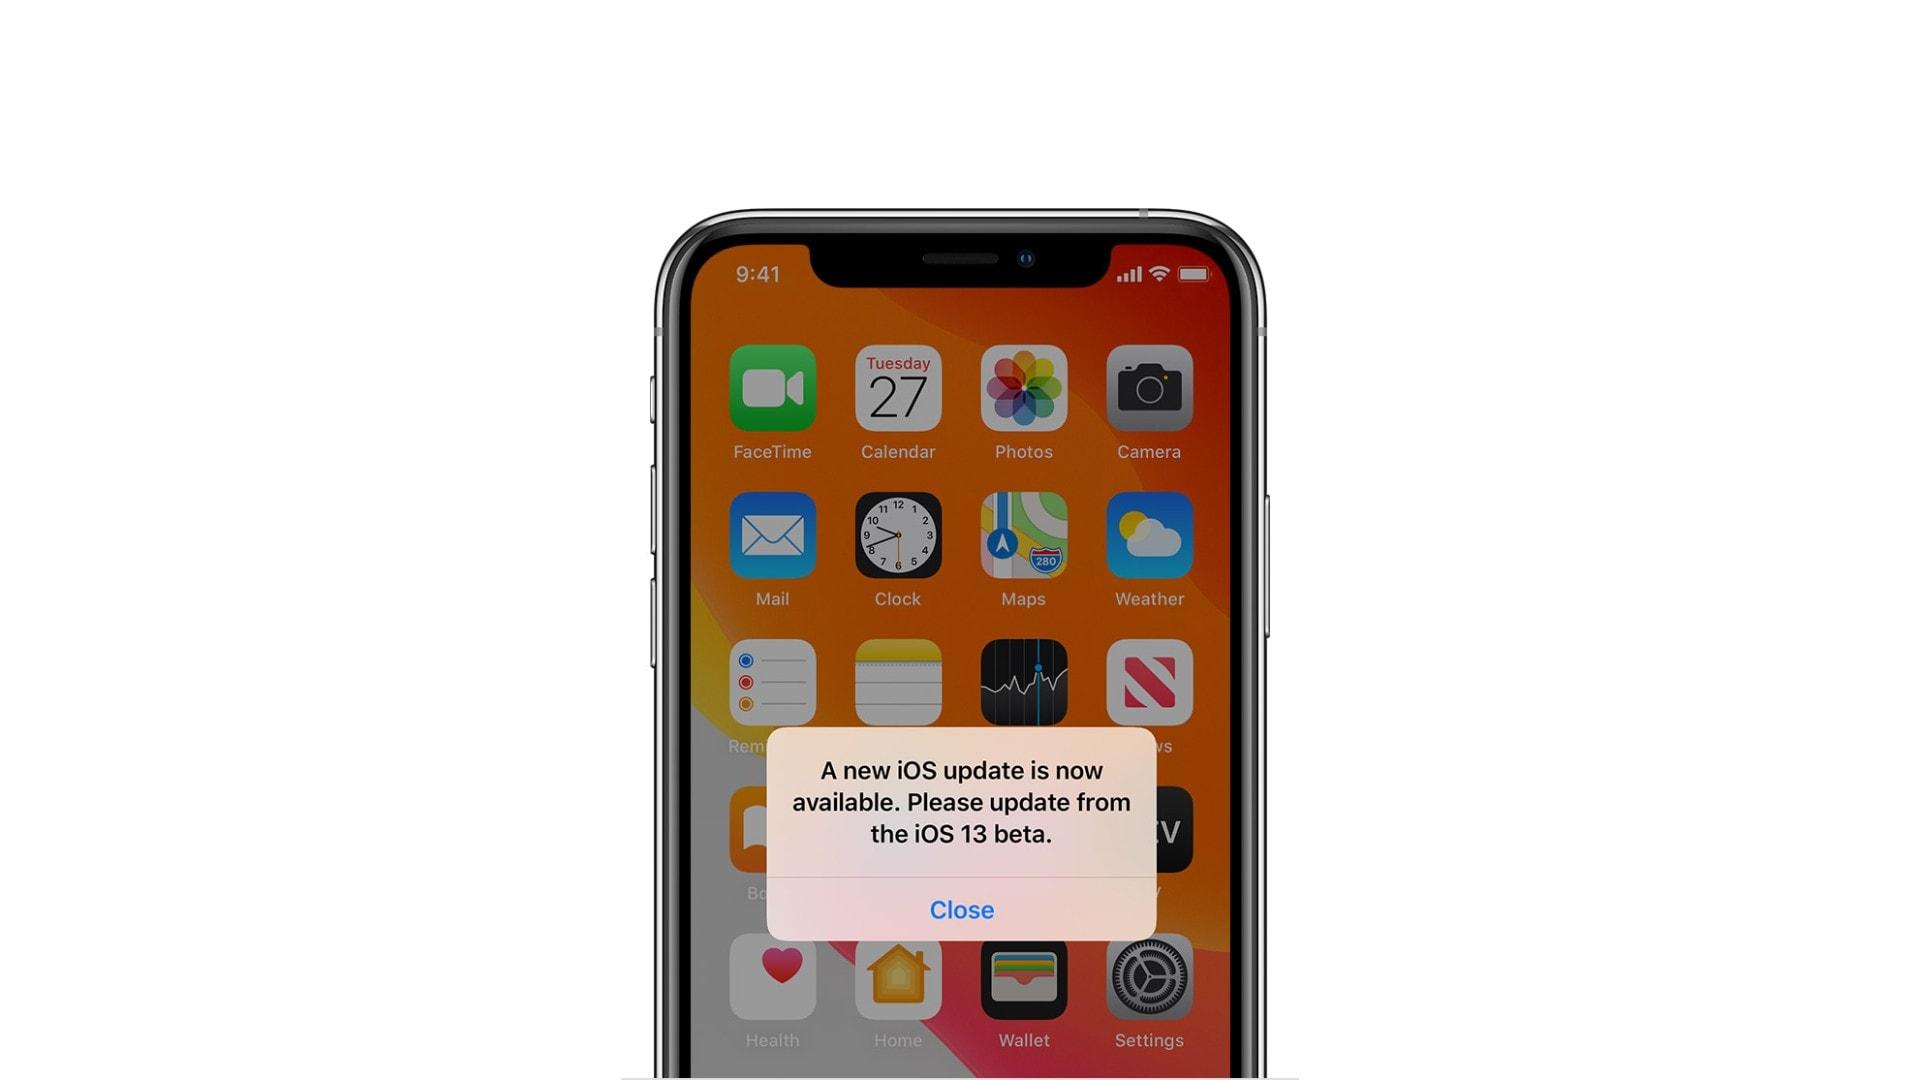 iPhone update notification